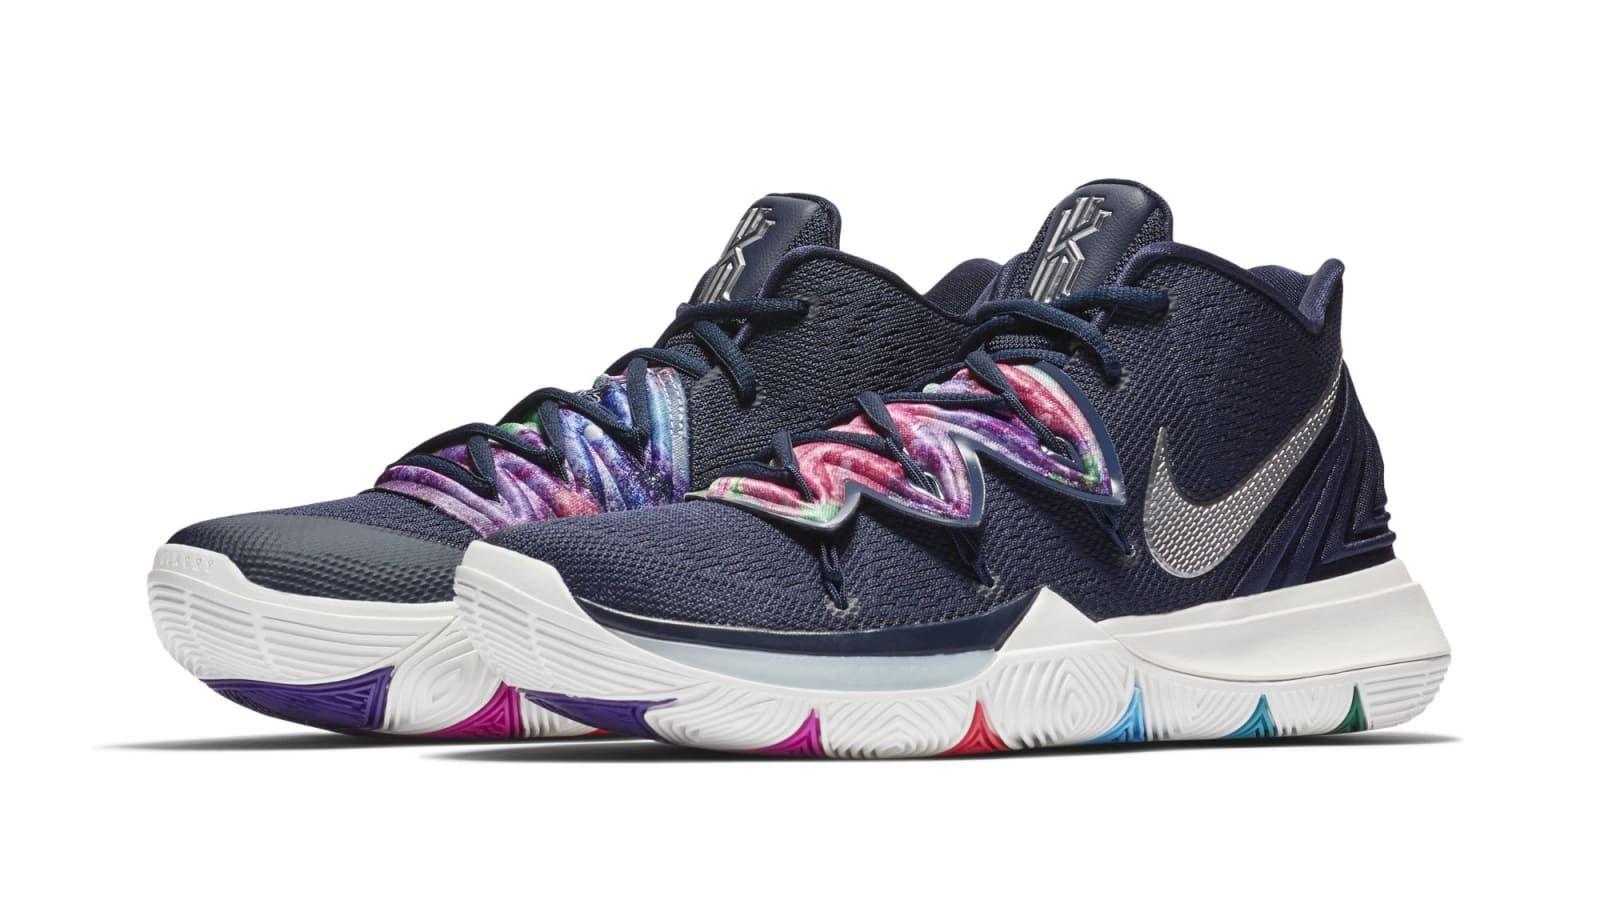 Nike Kyrie 5 'Multi-Color' | Sneakers men fashion, Sneakers ...